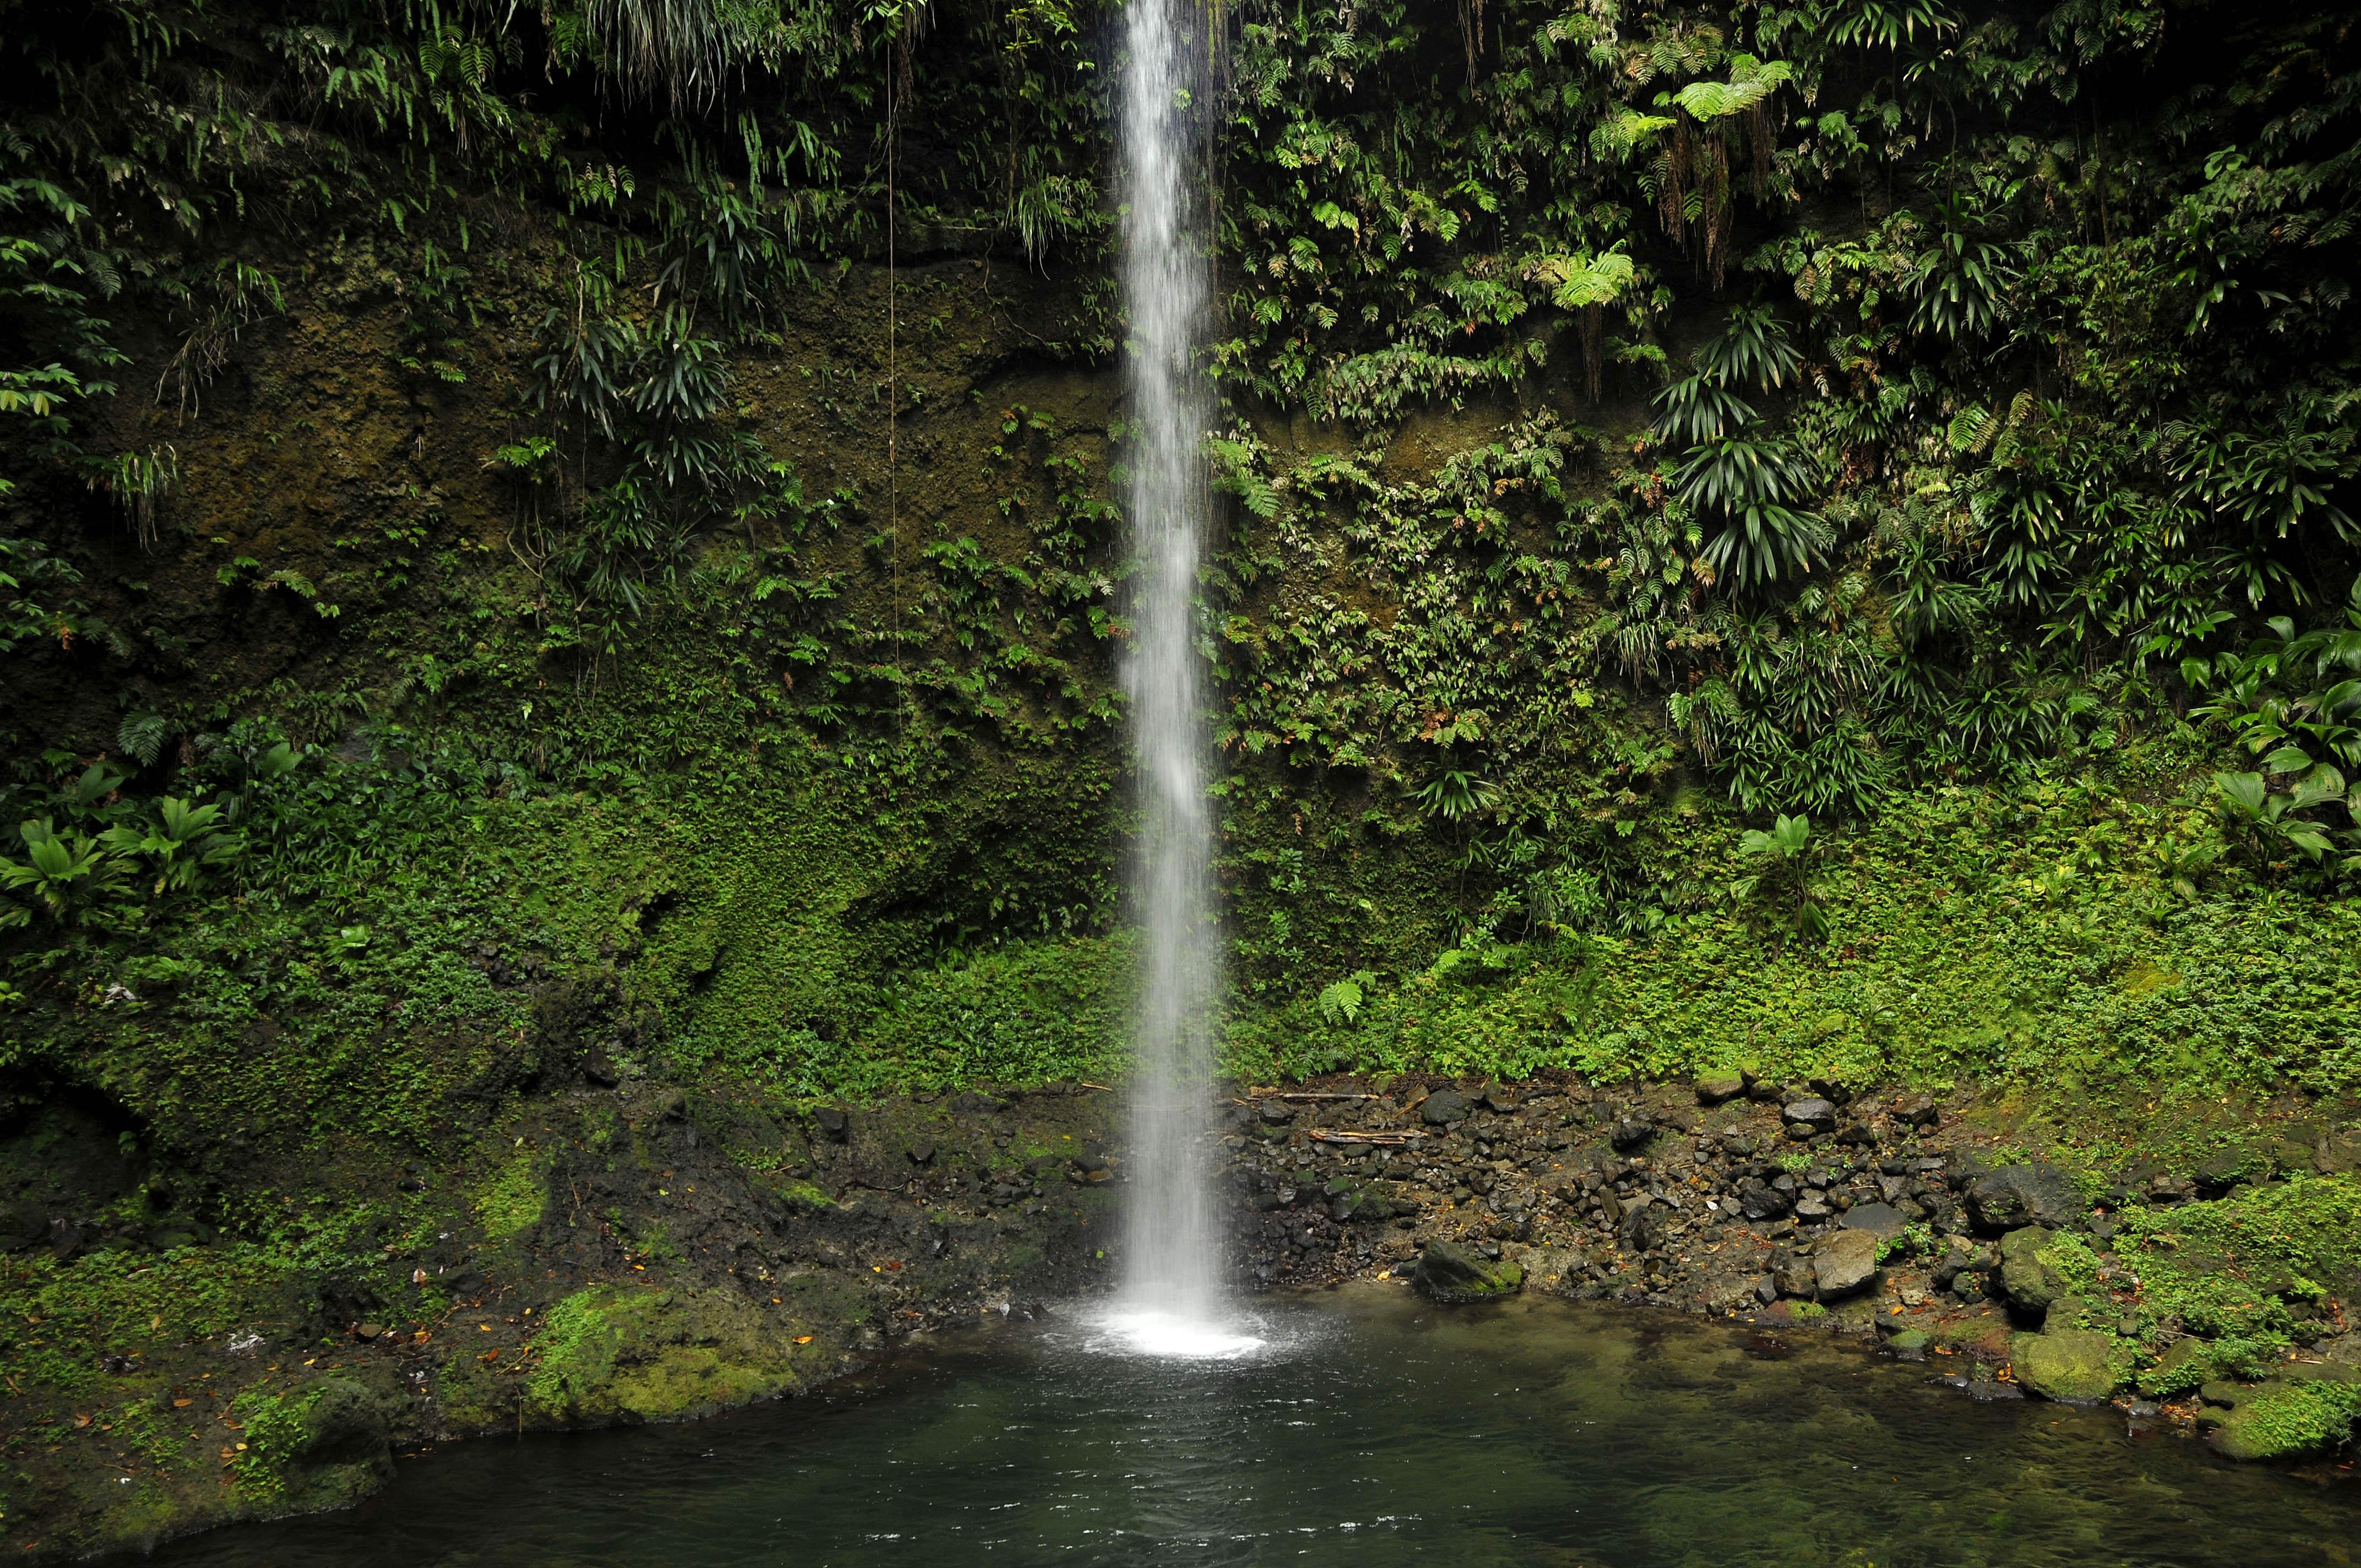 Dominica - Spanny Falls I